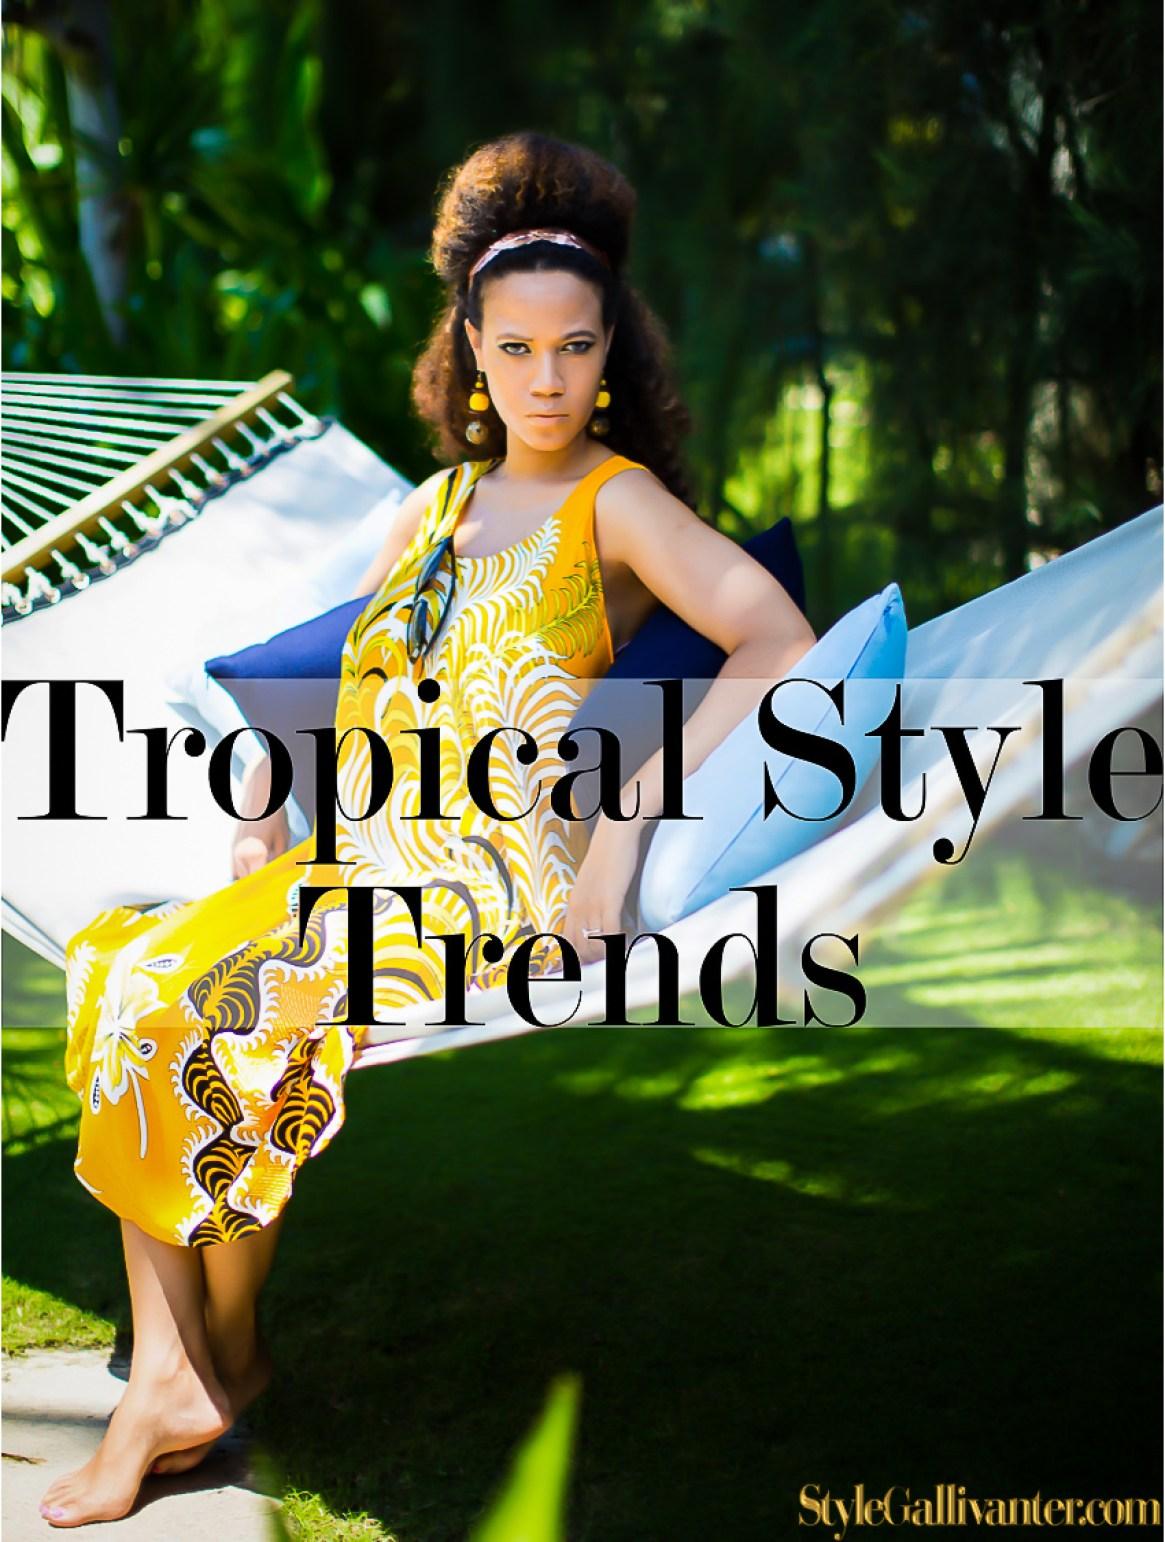 stylegallivanter.com_sakhino_best-fashion-style-blogs-melbourne-australia_best-looking-natural-hair-bloggers-usa-australia-africa_top-african-fashion-blogs_best-natural-hair-blogs-australia_most-stylish-fashion-bloggers-australia-botswana-36